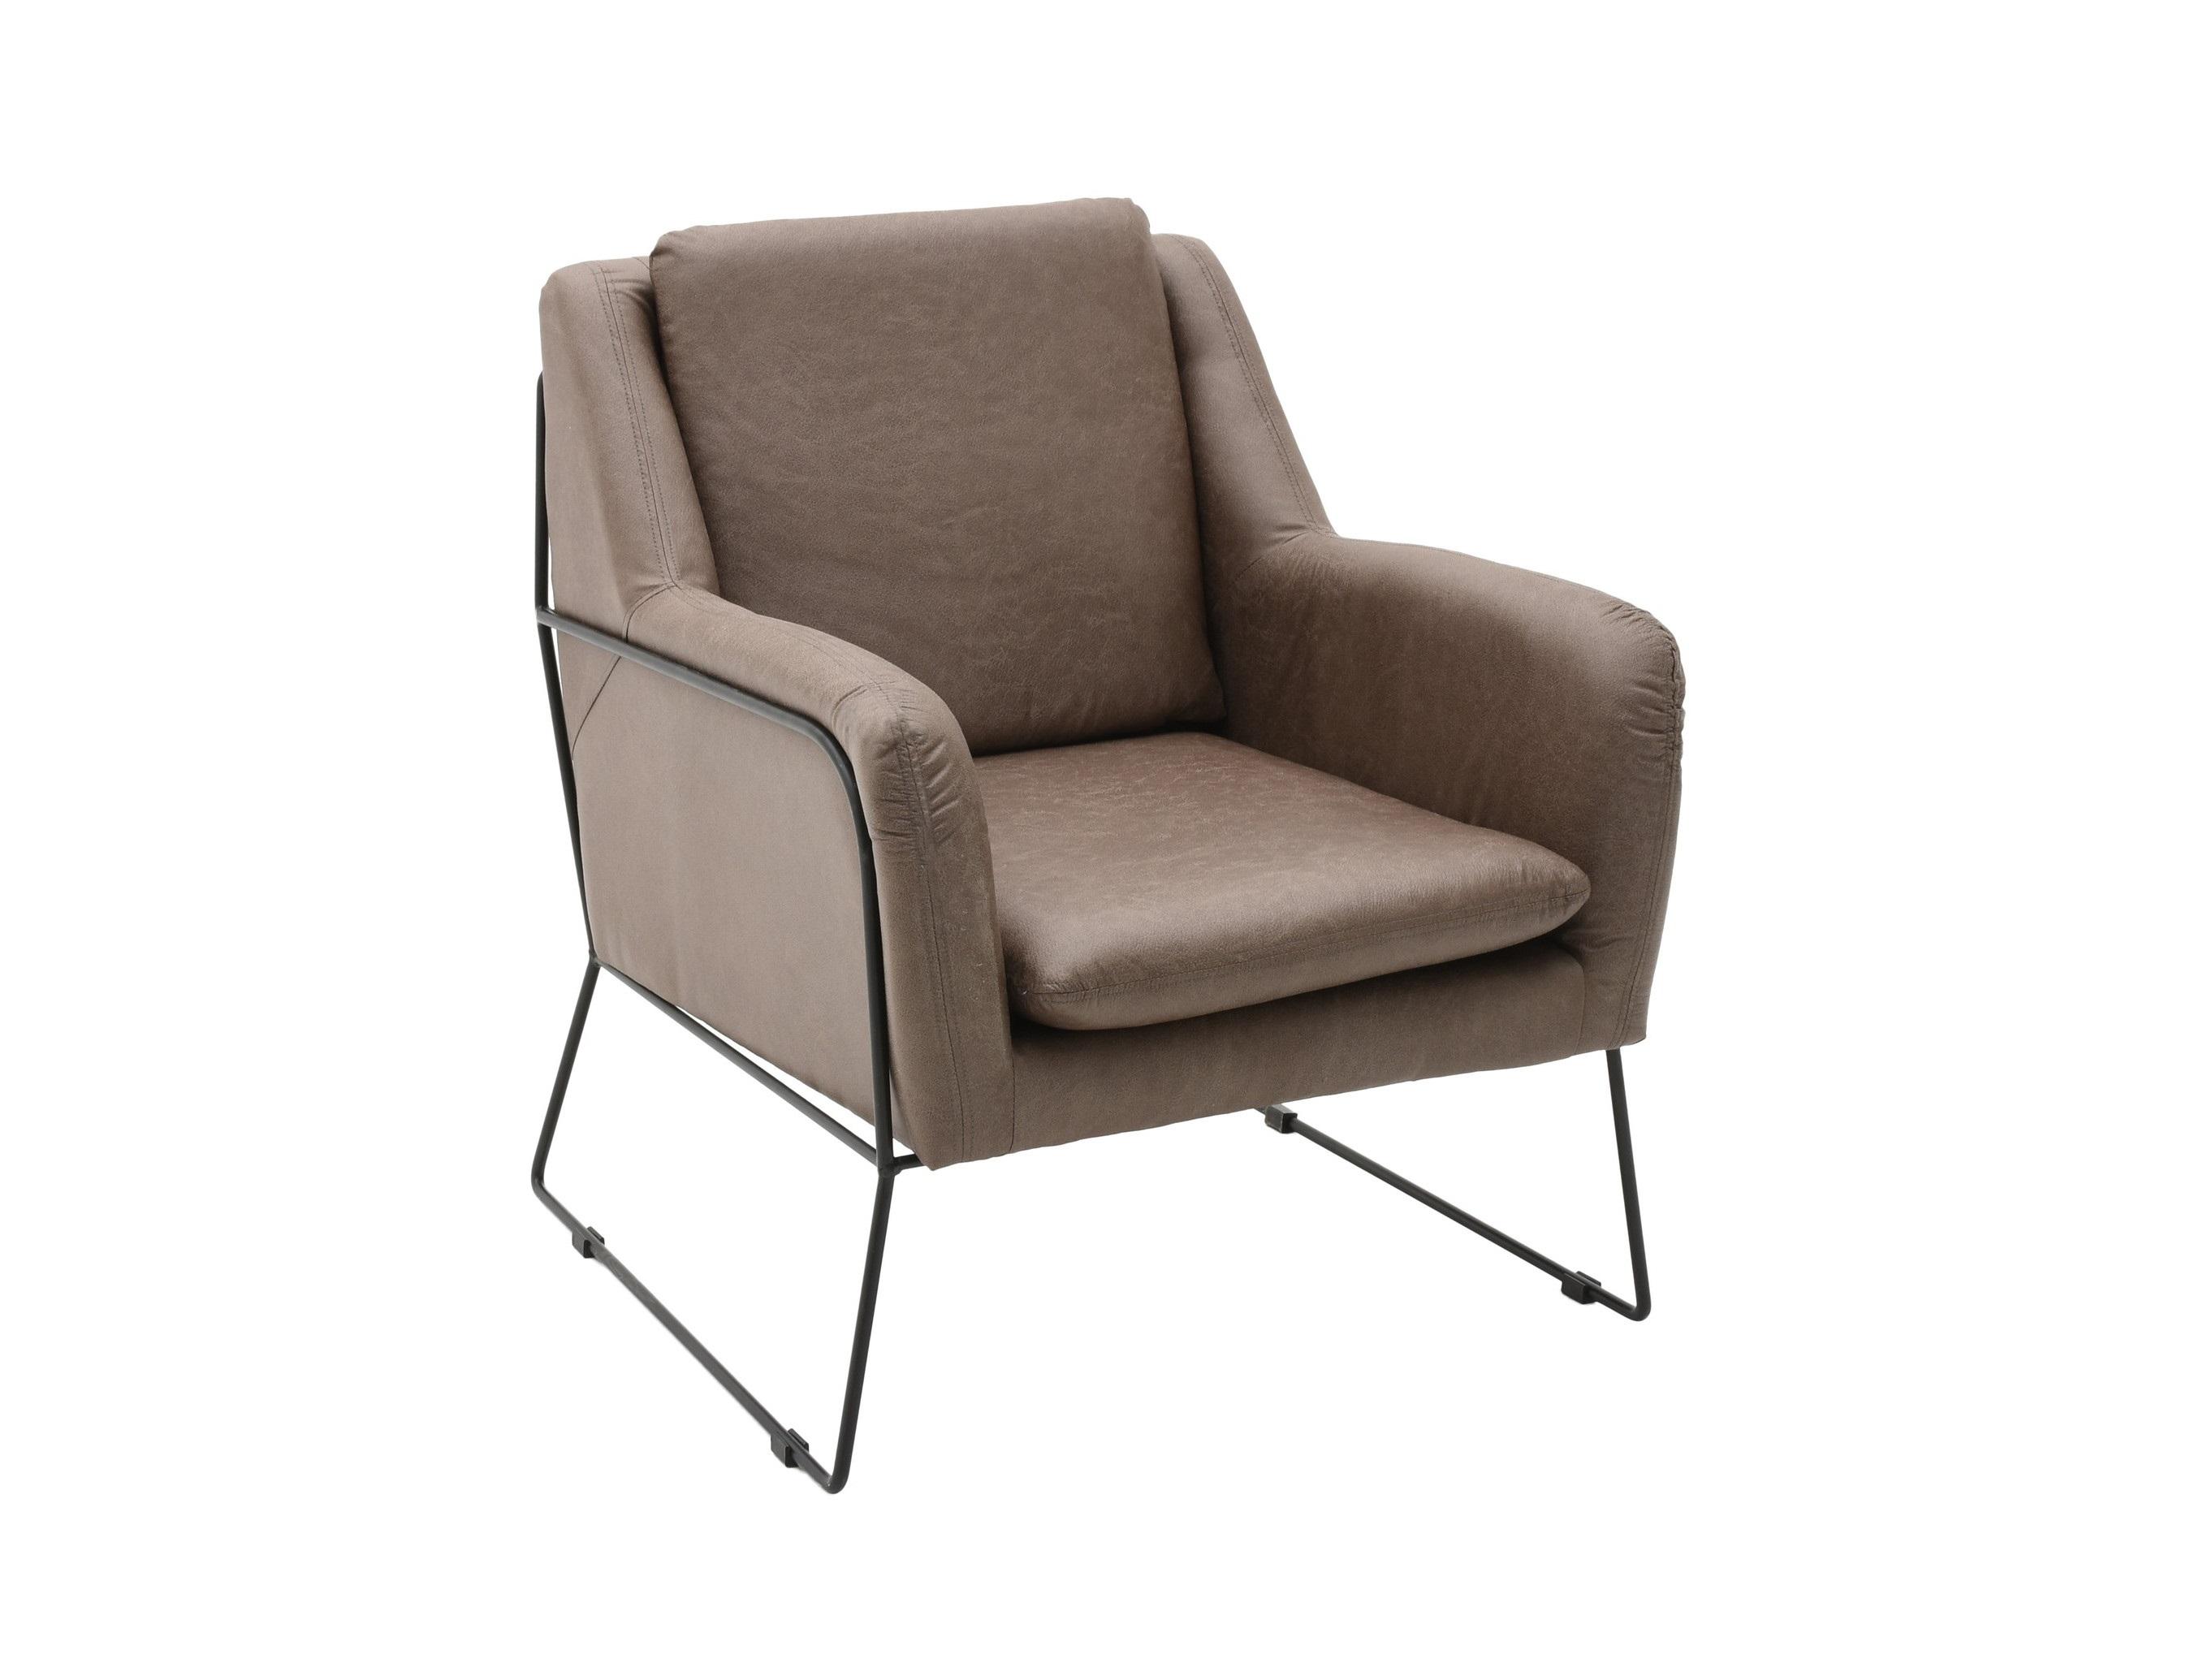 Кресло To4rooms 15438685 от thefurnish